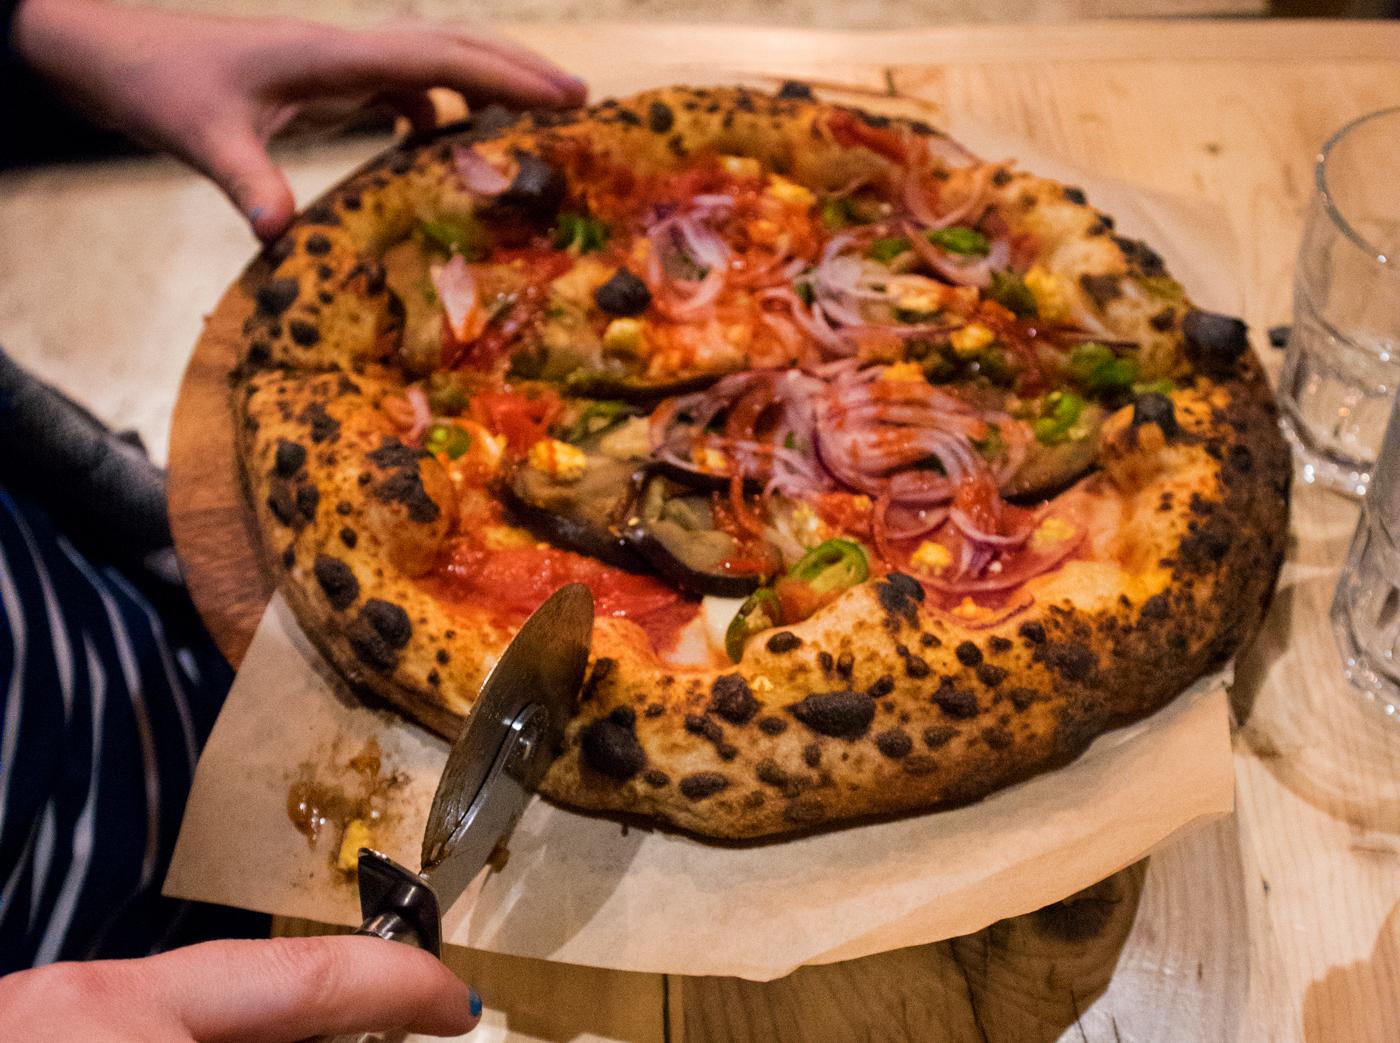 Vegan pizza from Purezza